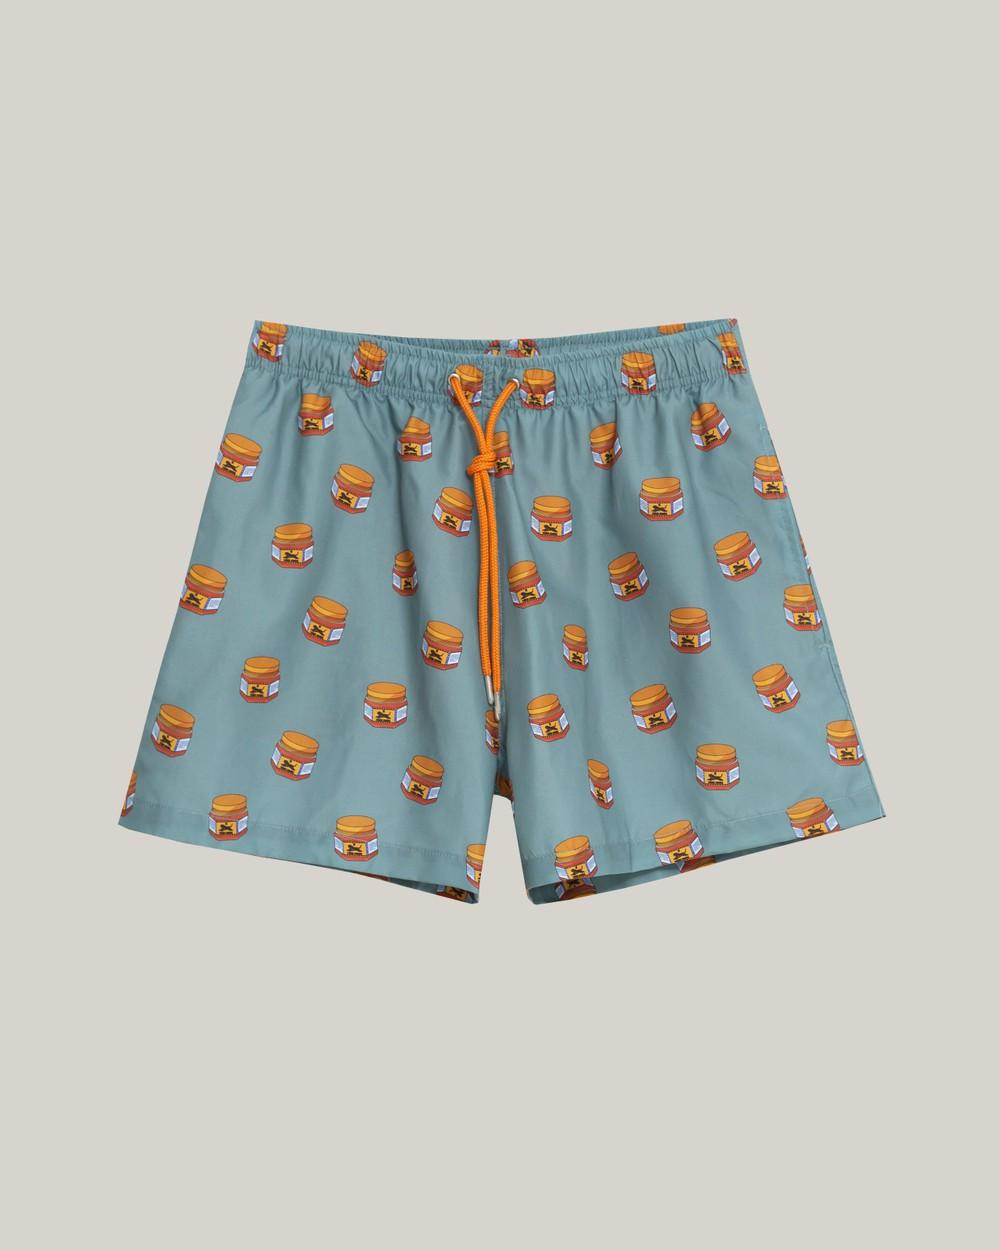 Tiger brava swimsuit - Brava Fabrics